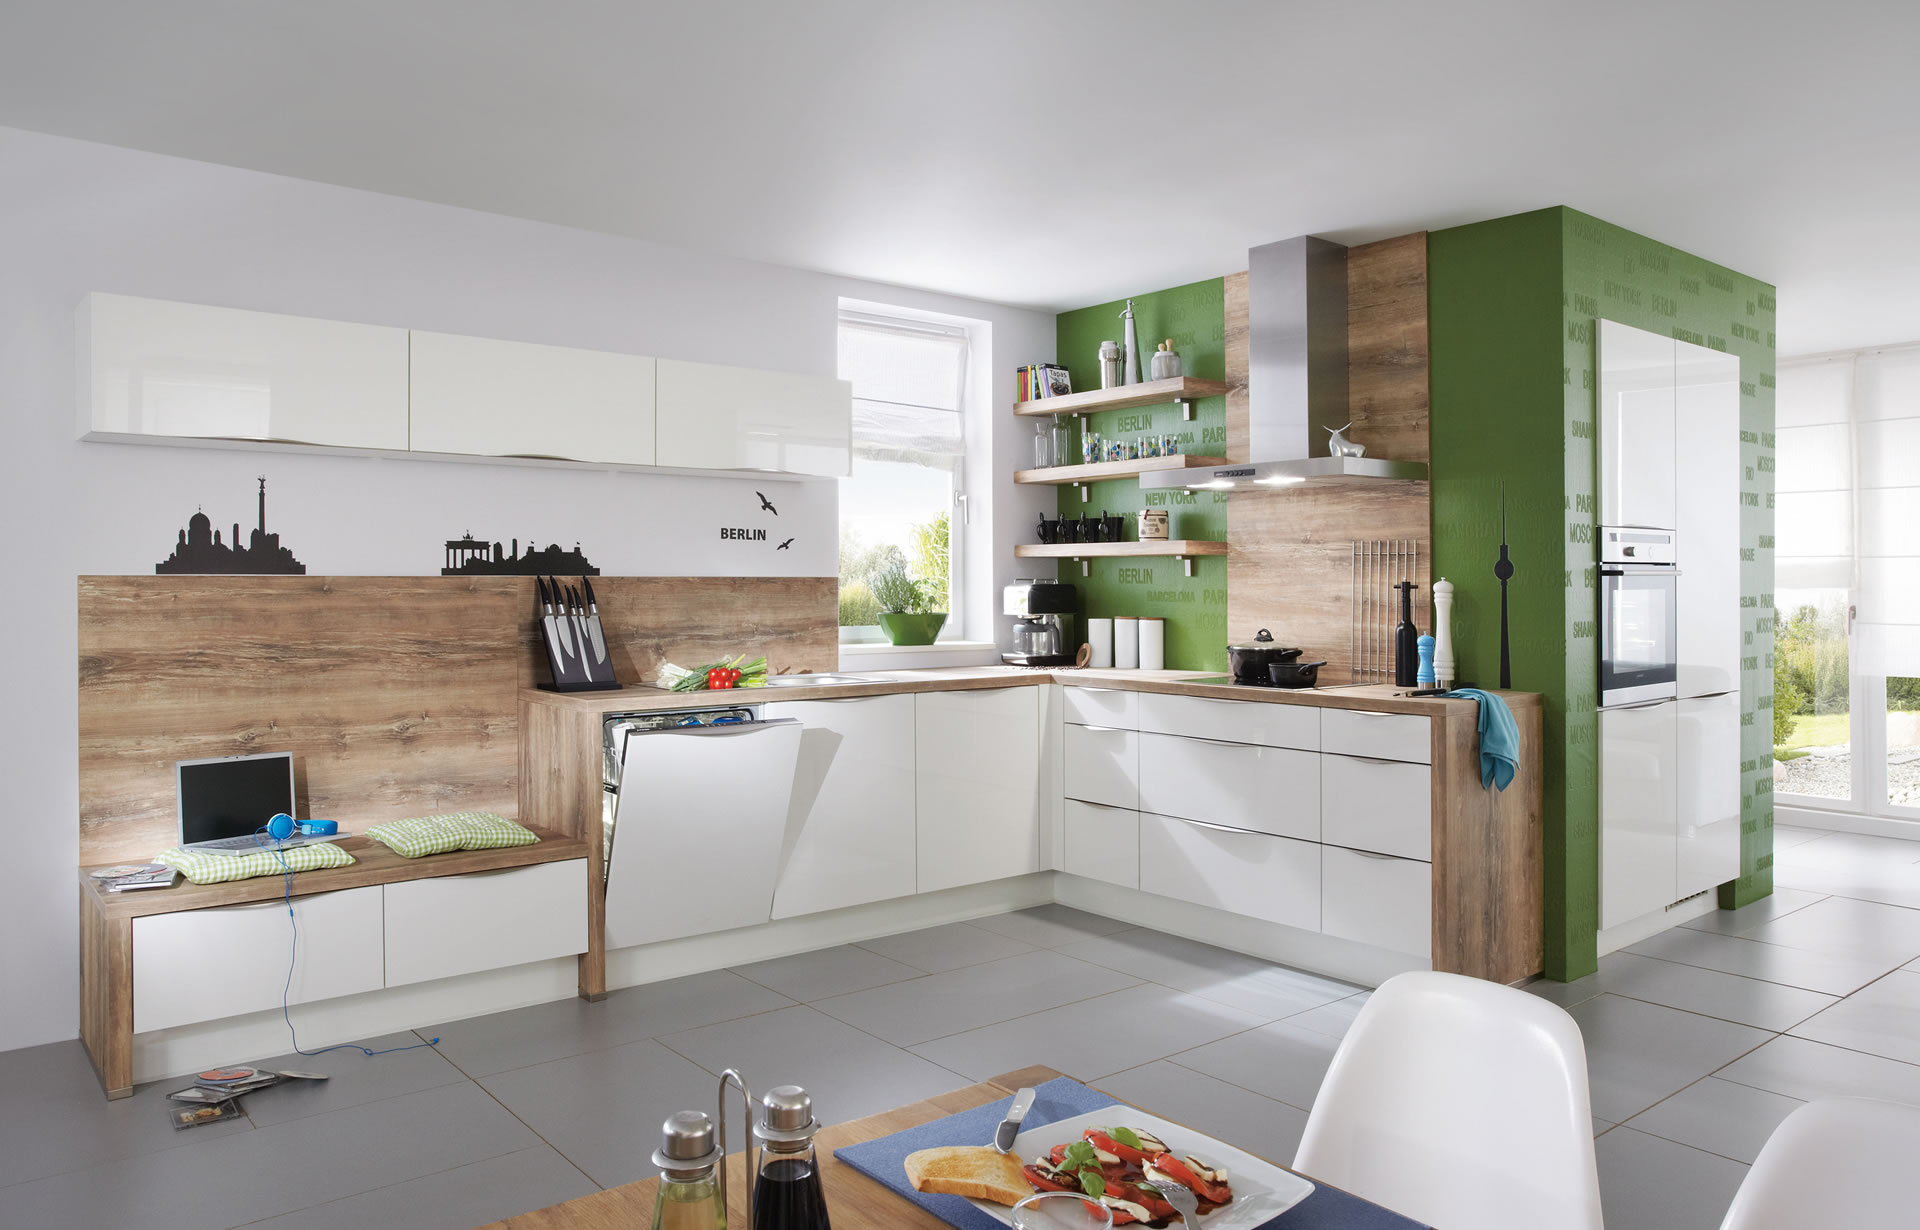 Emejing Nobilia Küchen Arbeitsplatten Photos - Ridgewayng.com ...